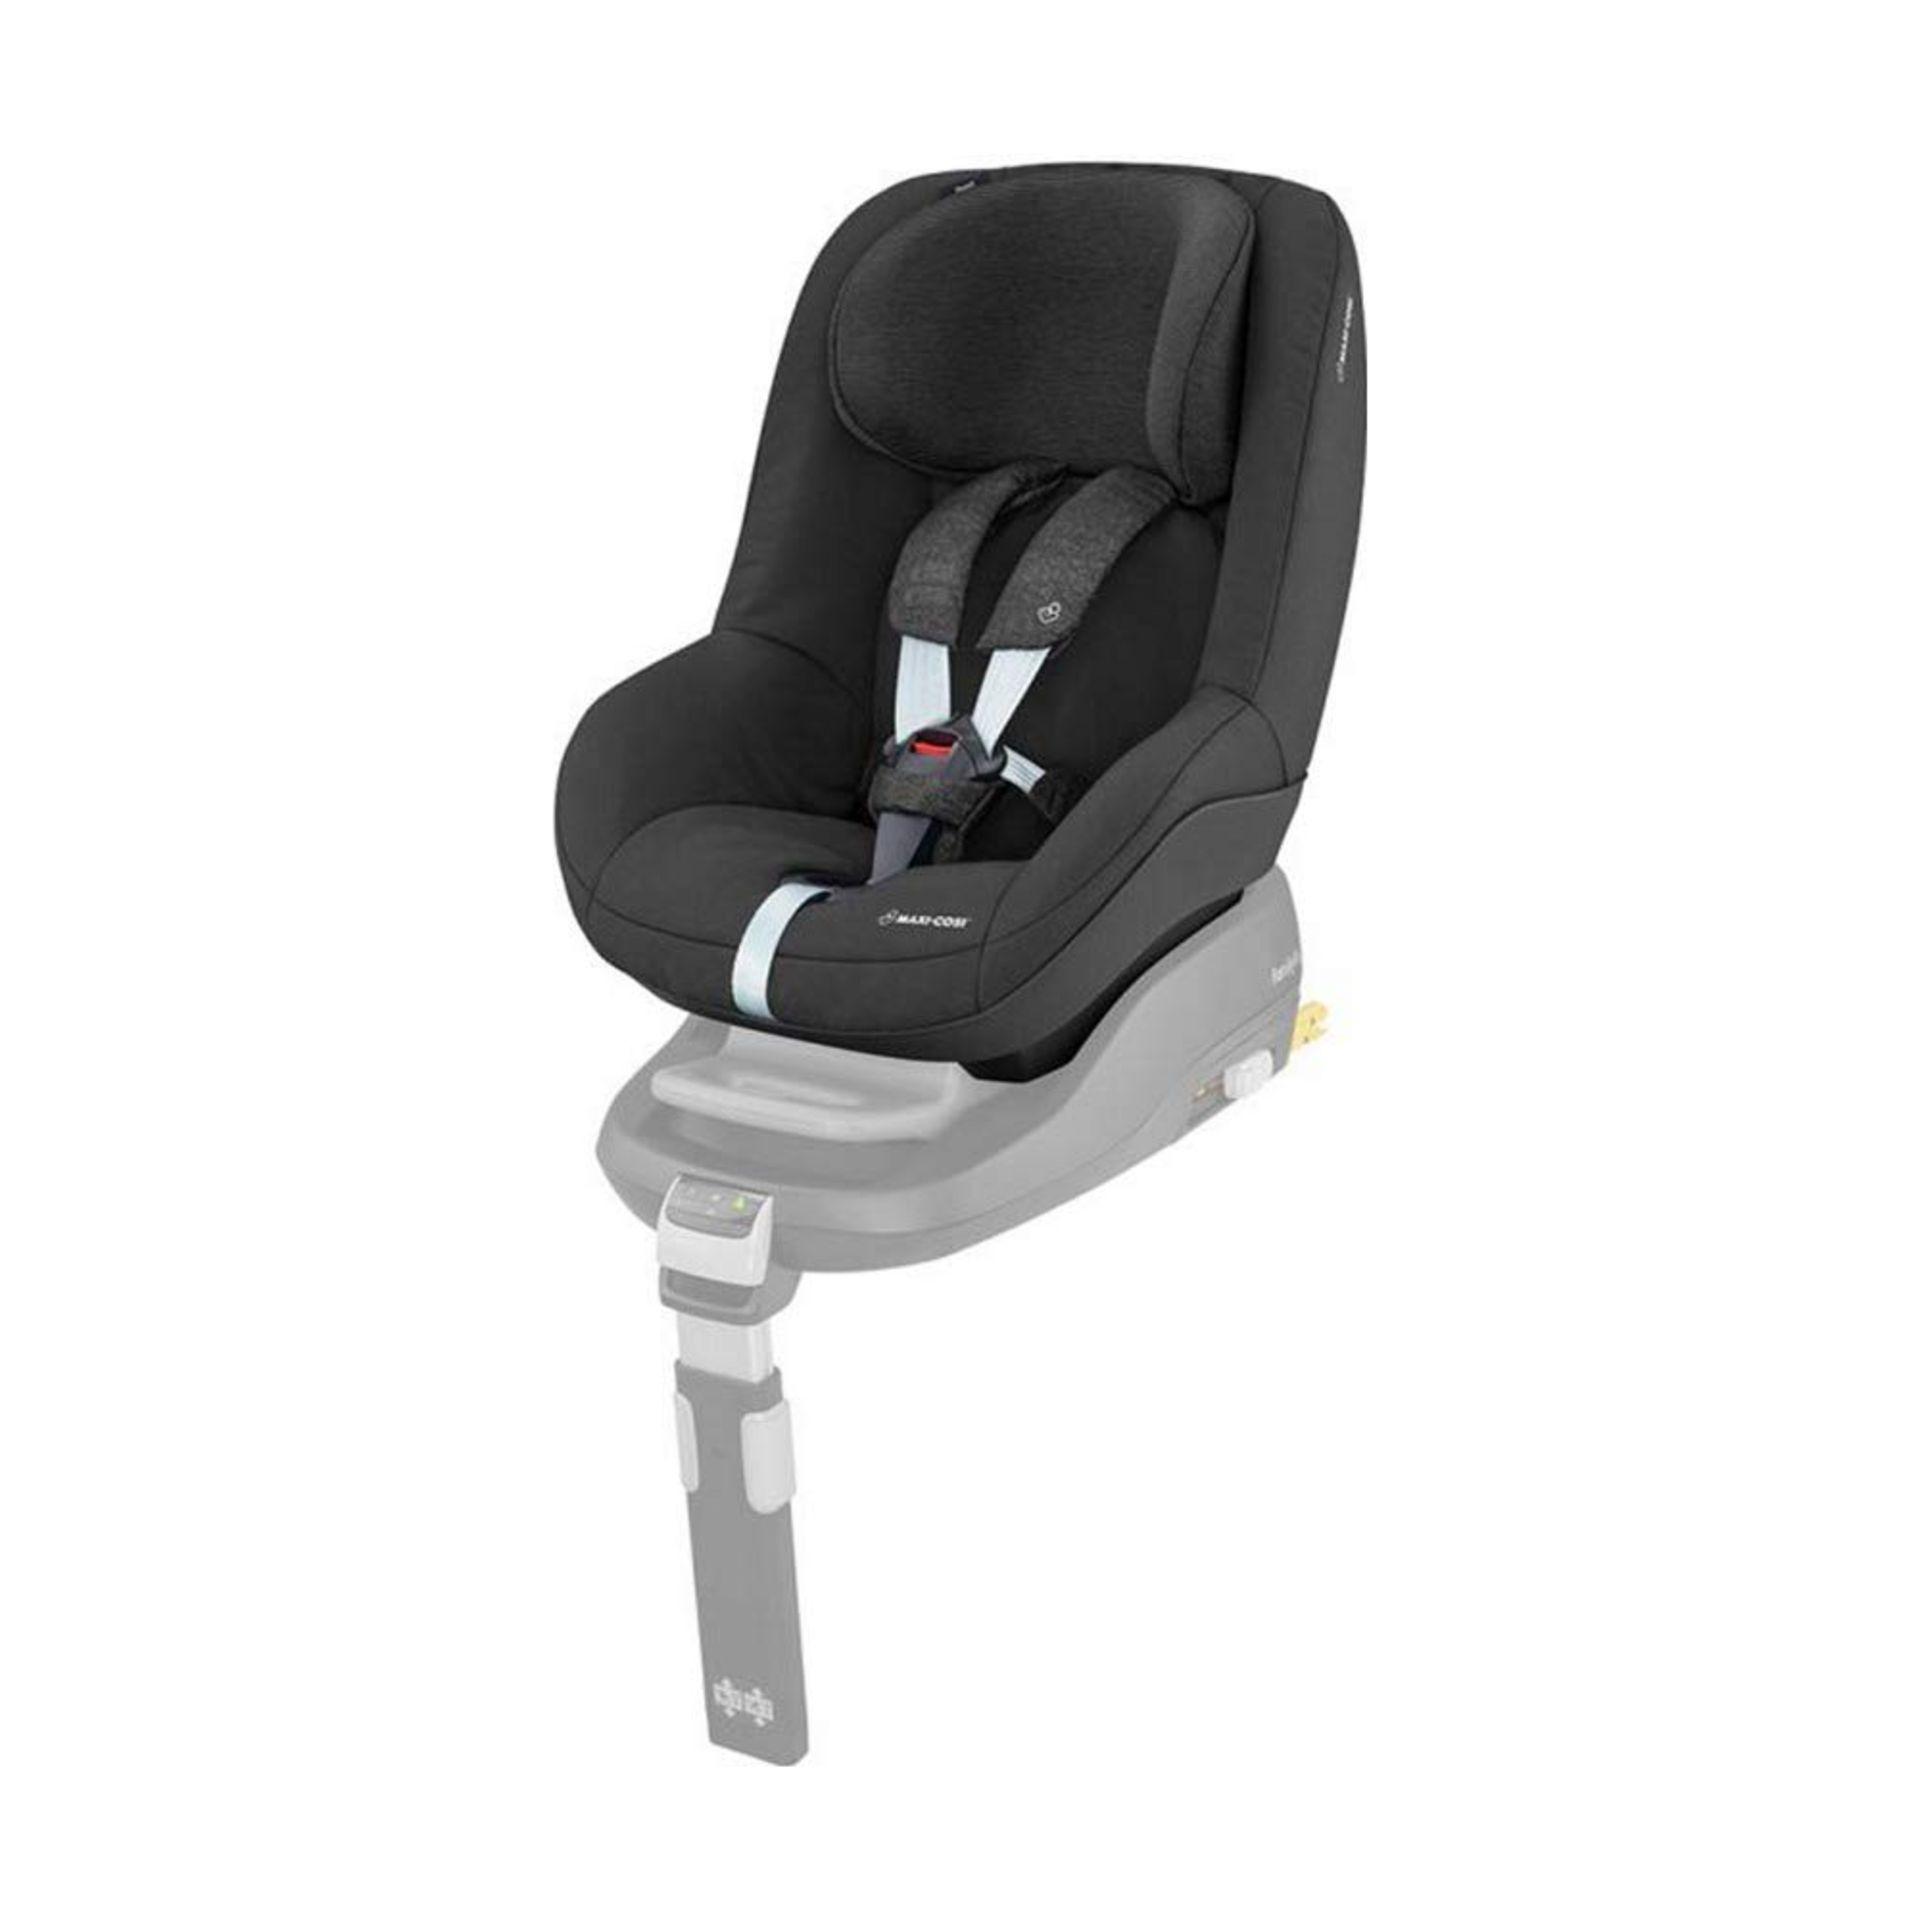 Lot 8 - Maxi-Cosi Pearl Toddler Car Seat Group 1, ISOFIX Car Seat RRP £130